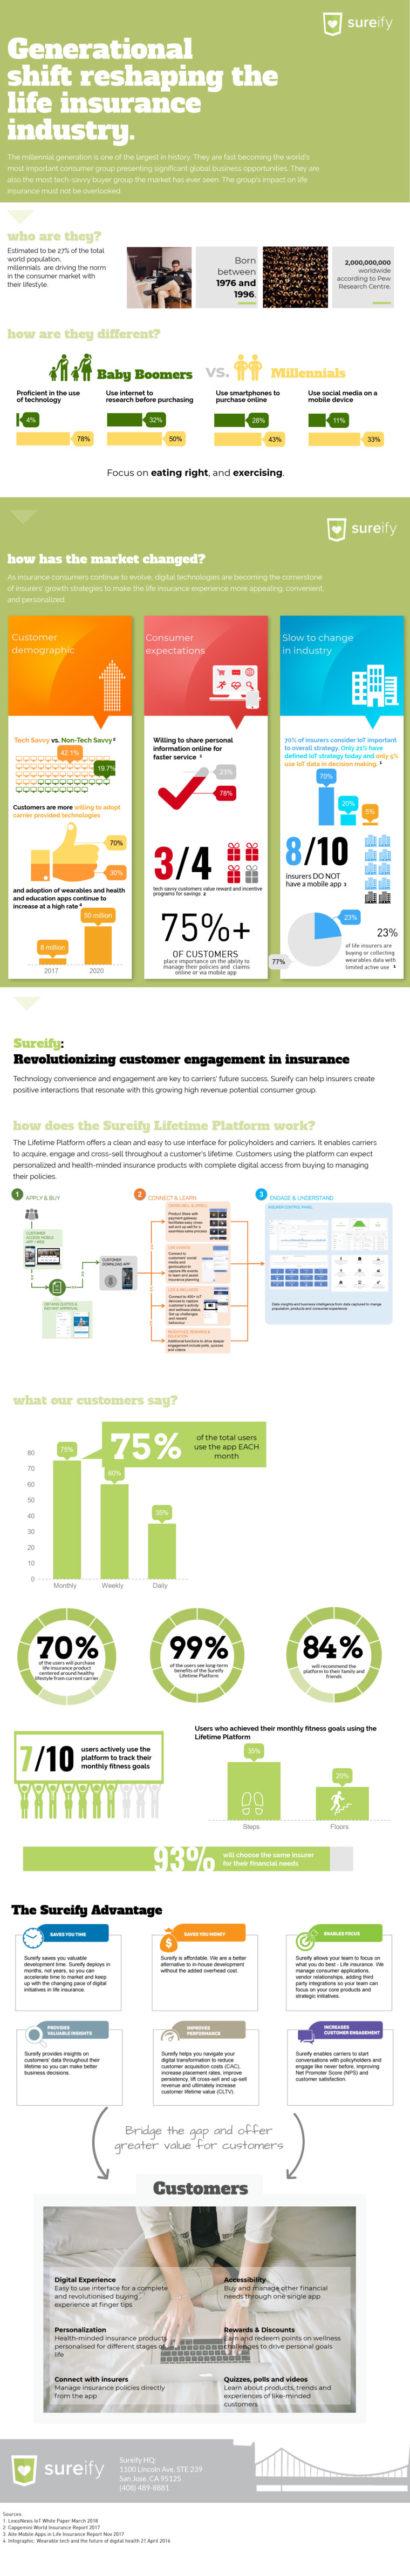 generational shift life insurance infographic